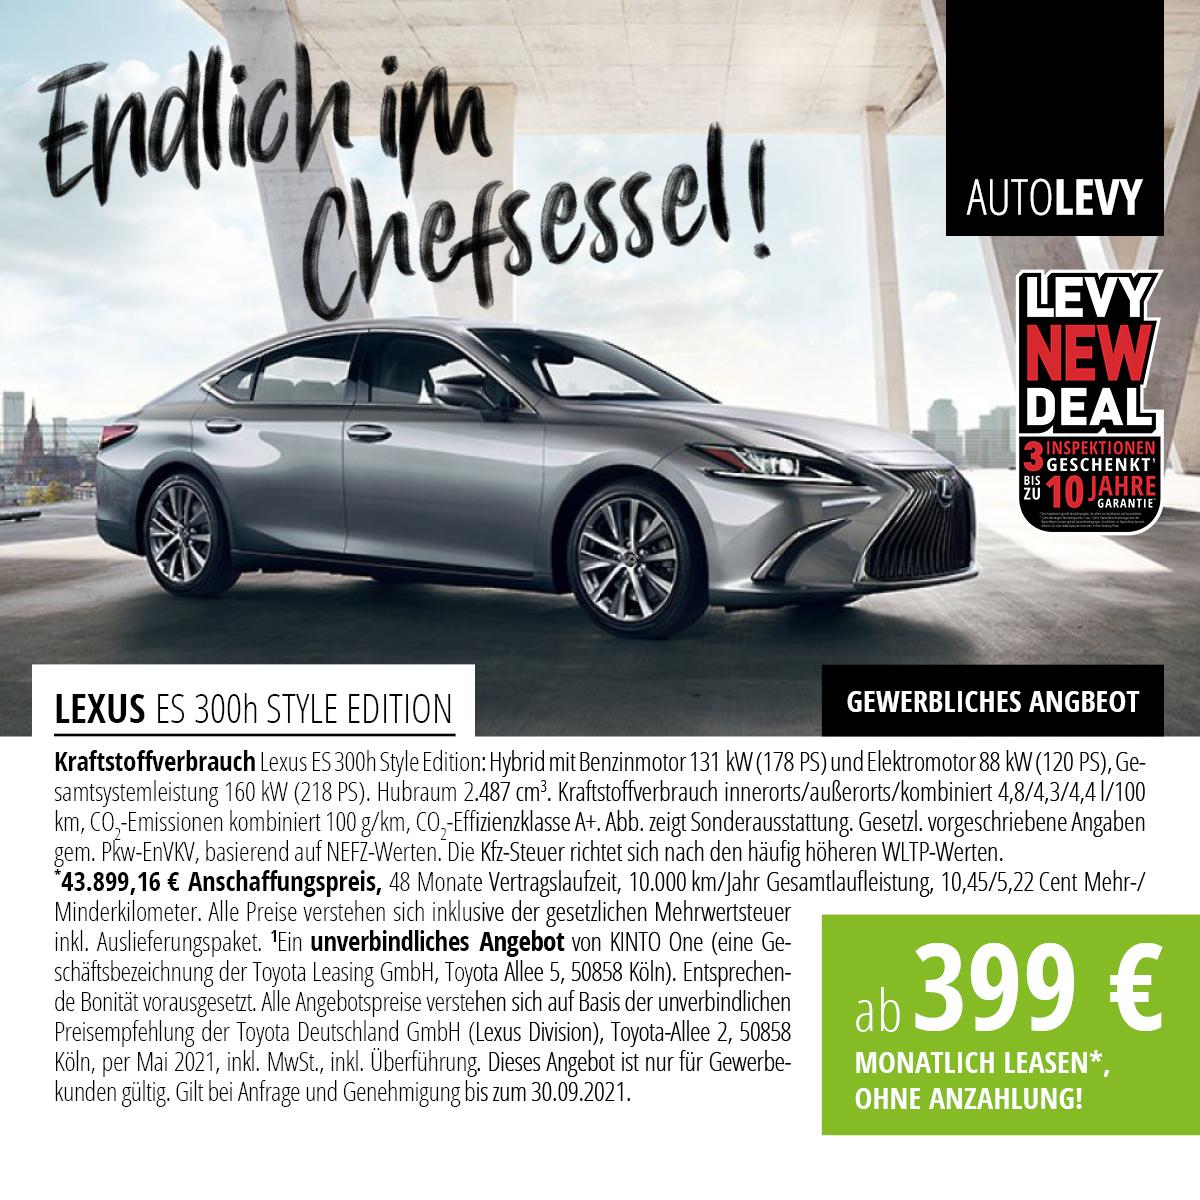 Lexus ES 300h Style Edition